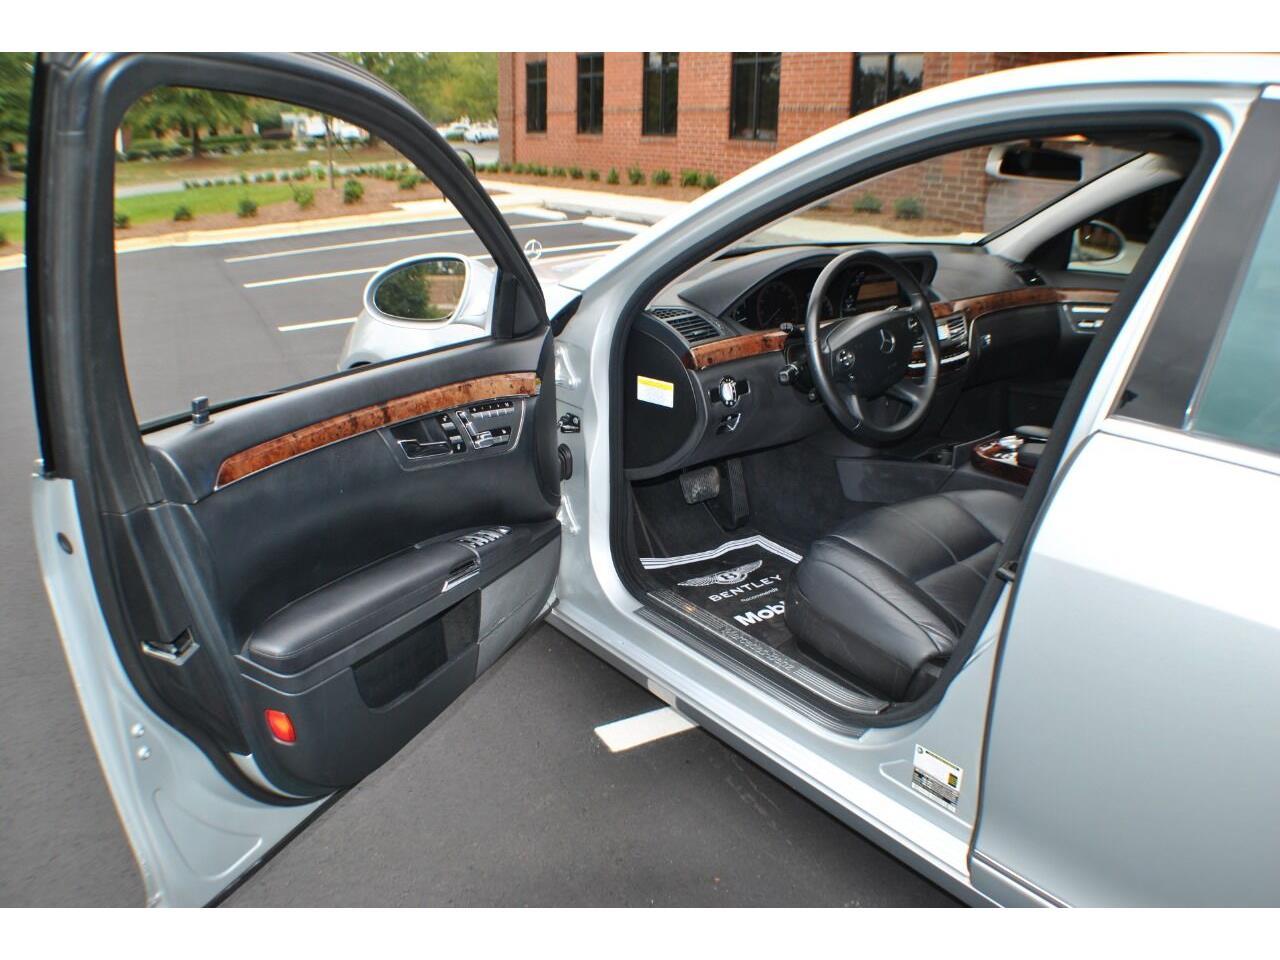 2008 Mercedes-Benz S-Class (CC-1410586) for sale in Charlotte, North Carolina